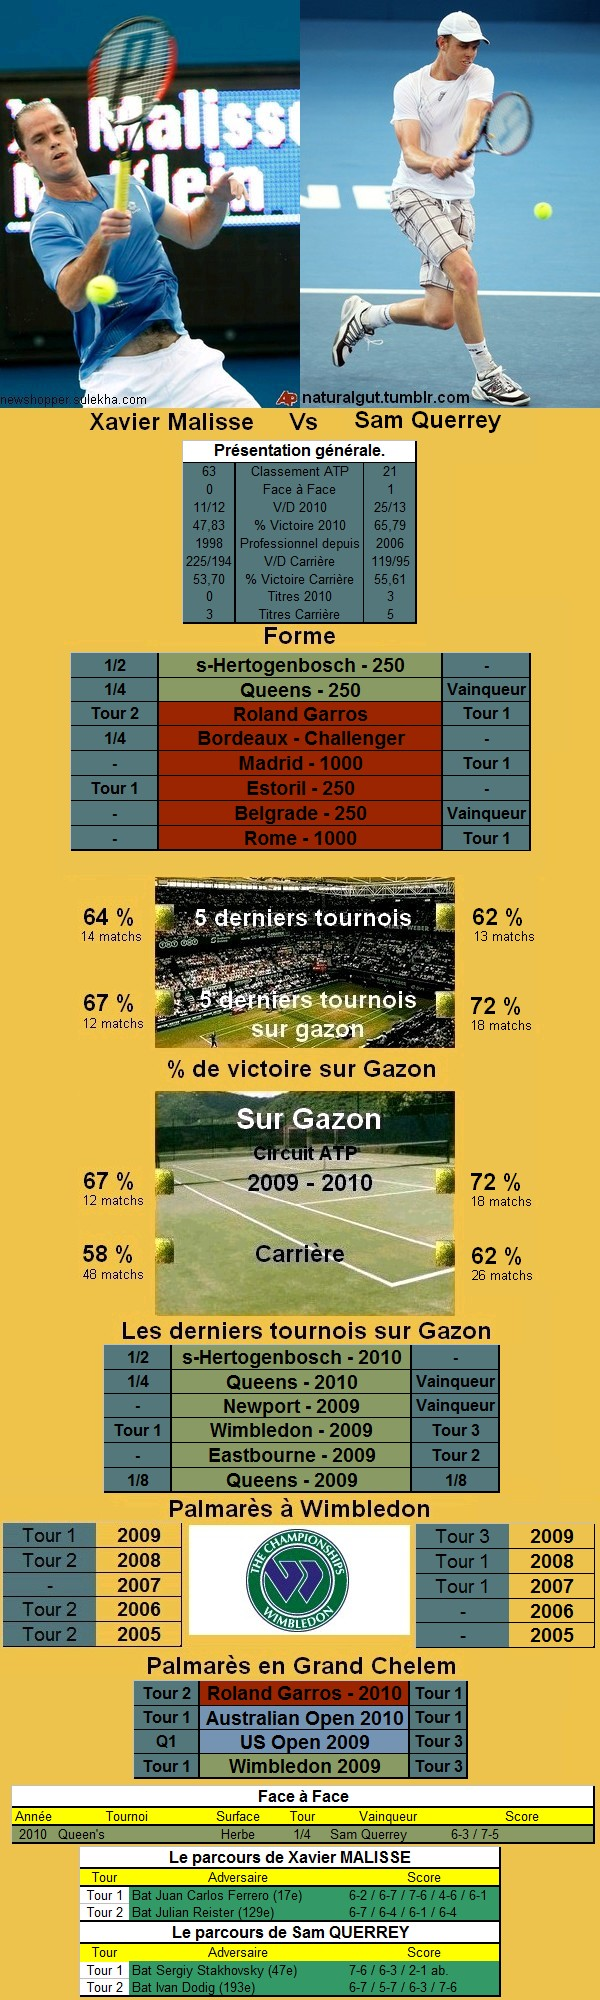 Statistiques tennis de Lopez contre Querrey à Wimbledon